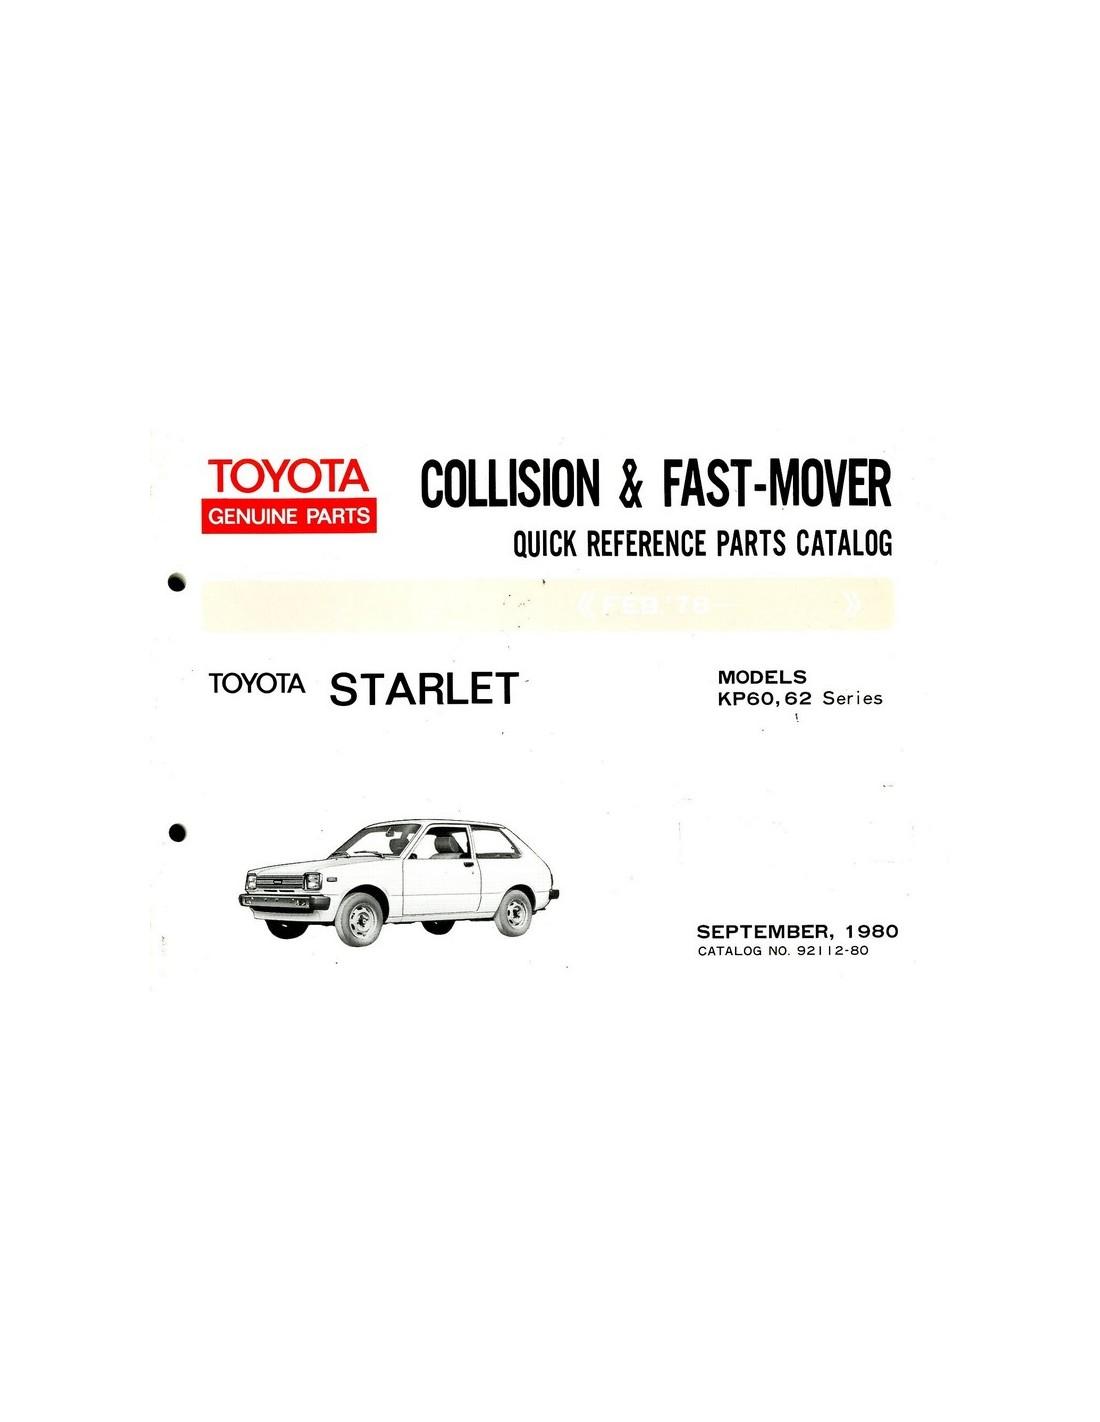 Toyota New Parts Online